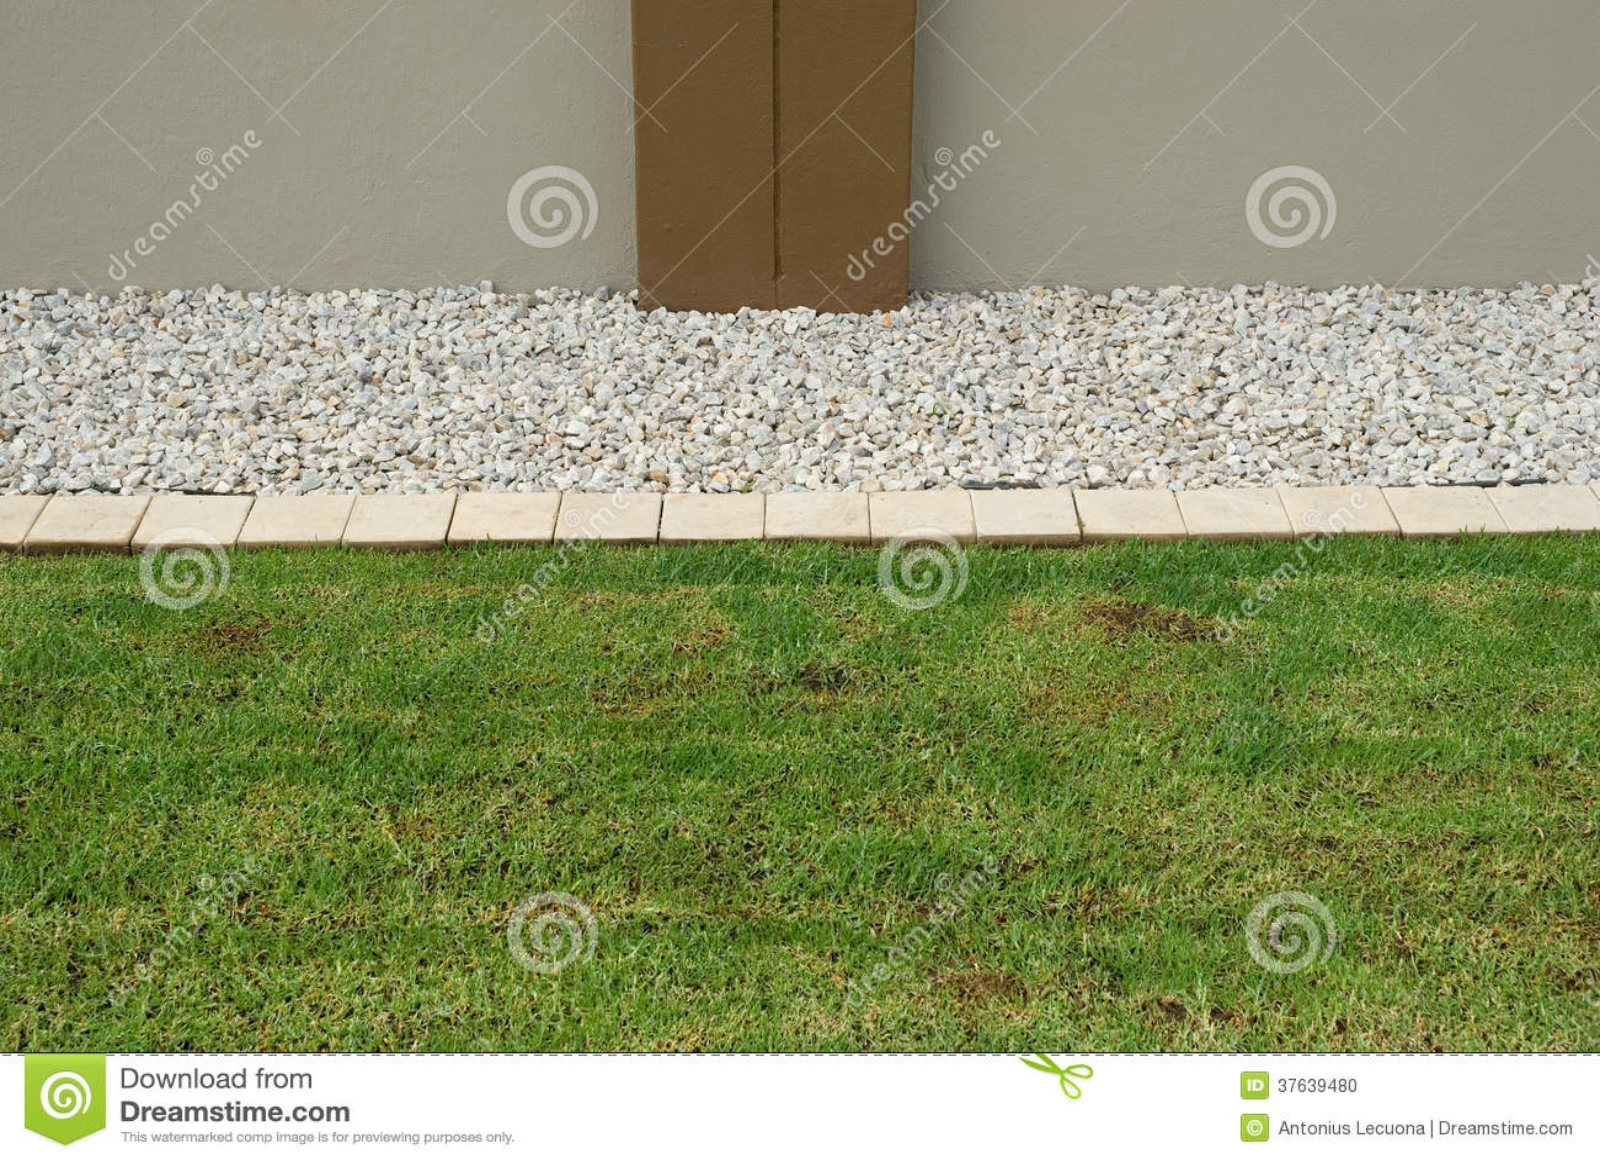 Horizontal Lawn Border Stock Photo Image 37639480